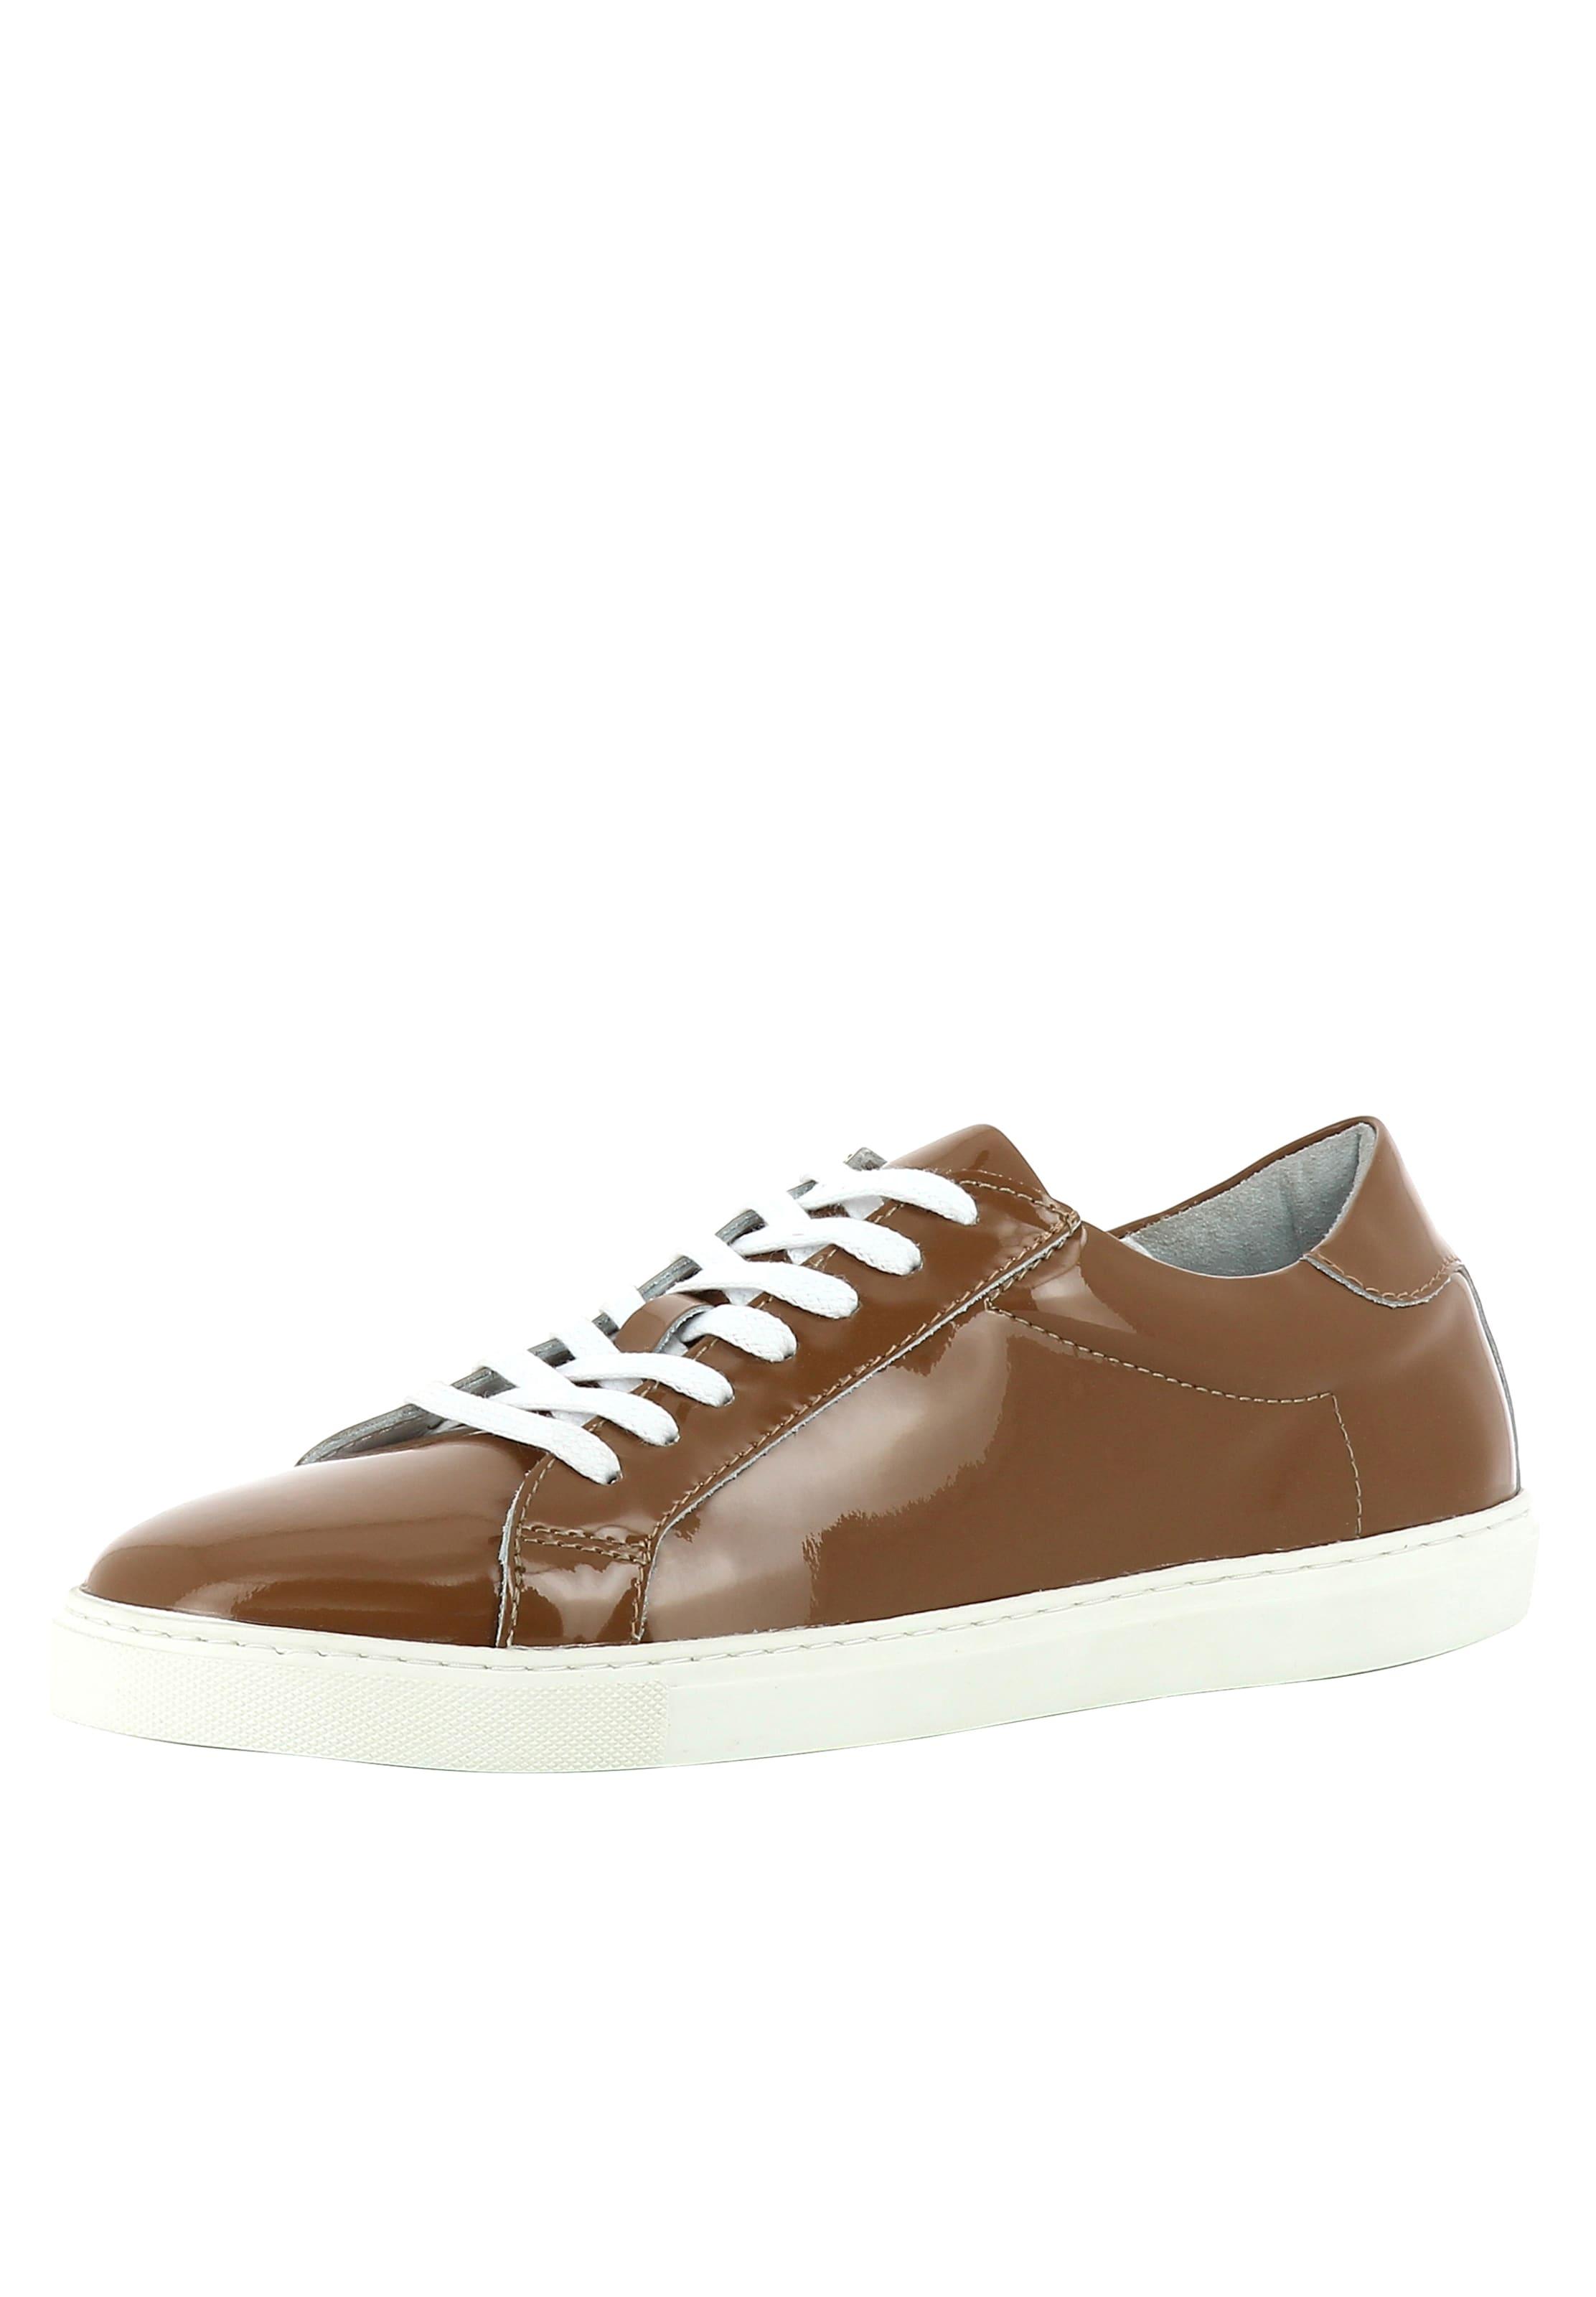 EVITA Damen Sneaker MARISA Verschleißfeste billige Schuhe